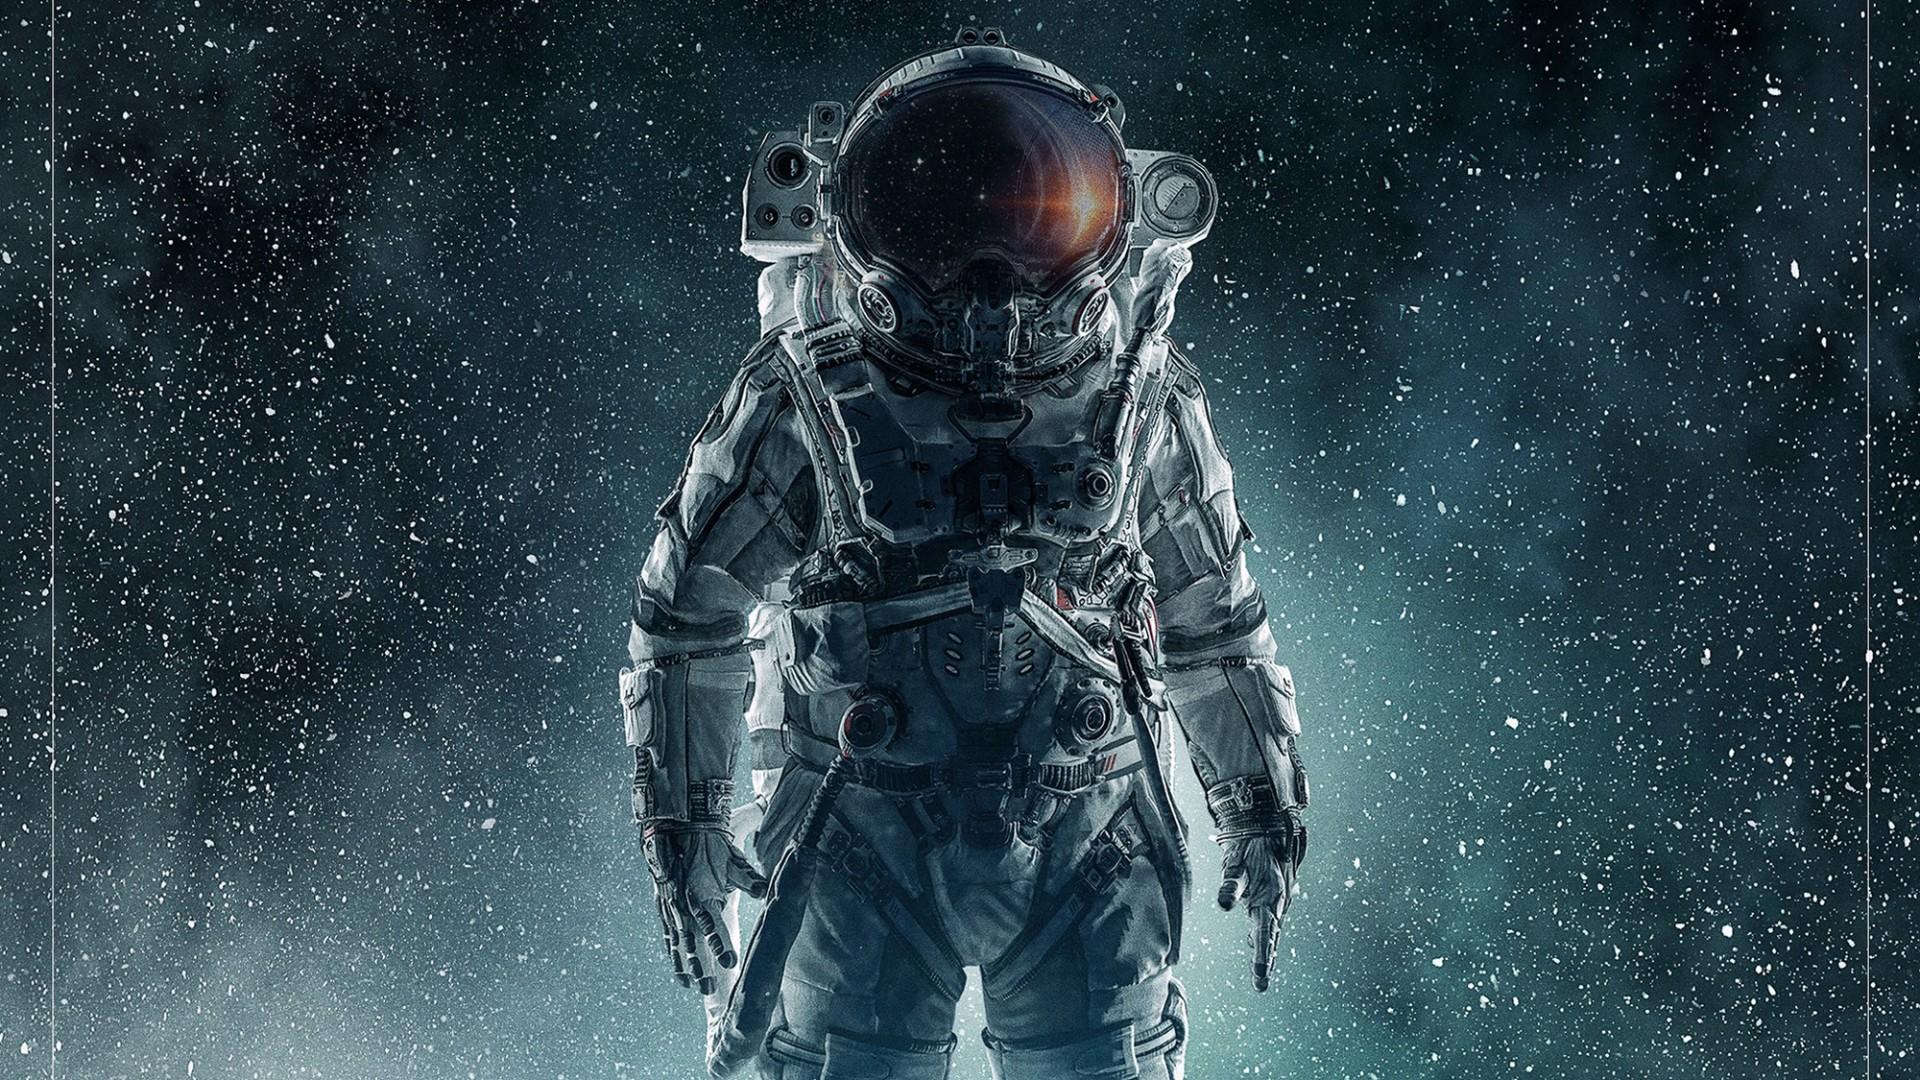 Papel De Parede Pc Tumblr Astronauta